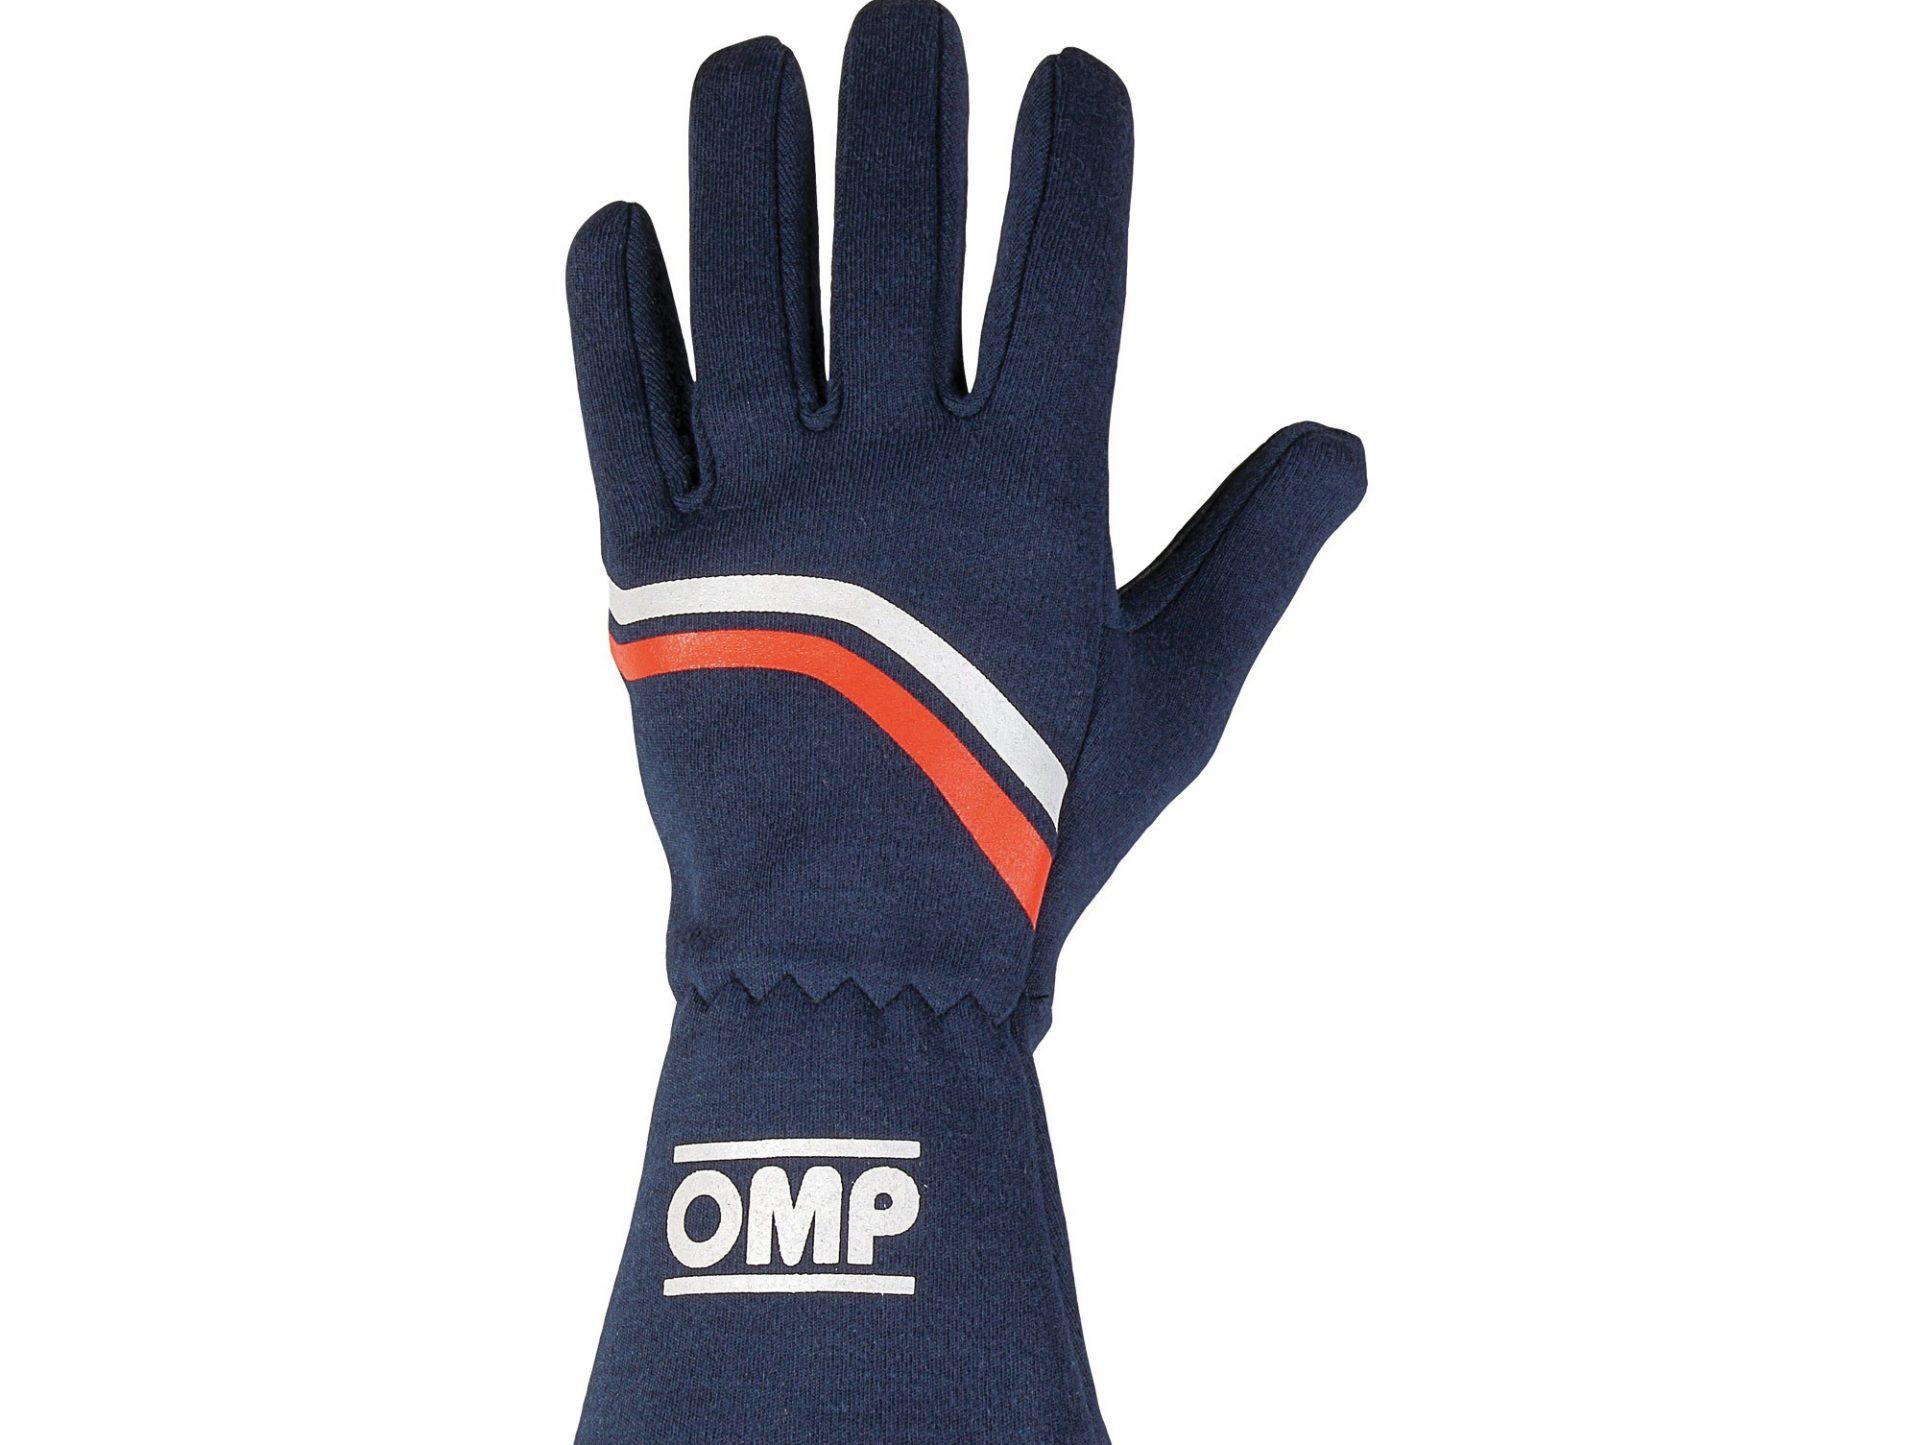 Нов продукт: OMP Dijon, FIA, Gloves